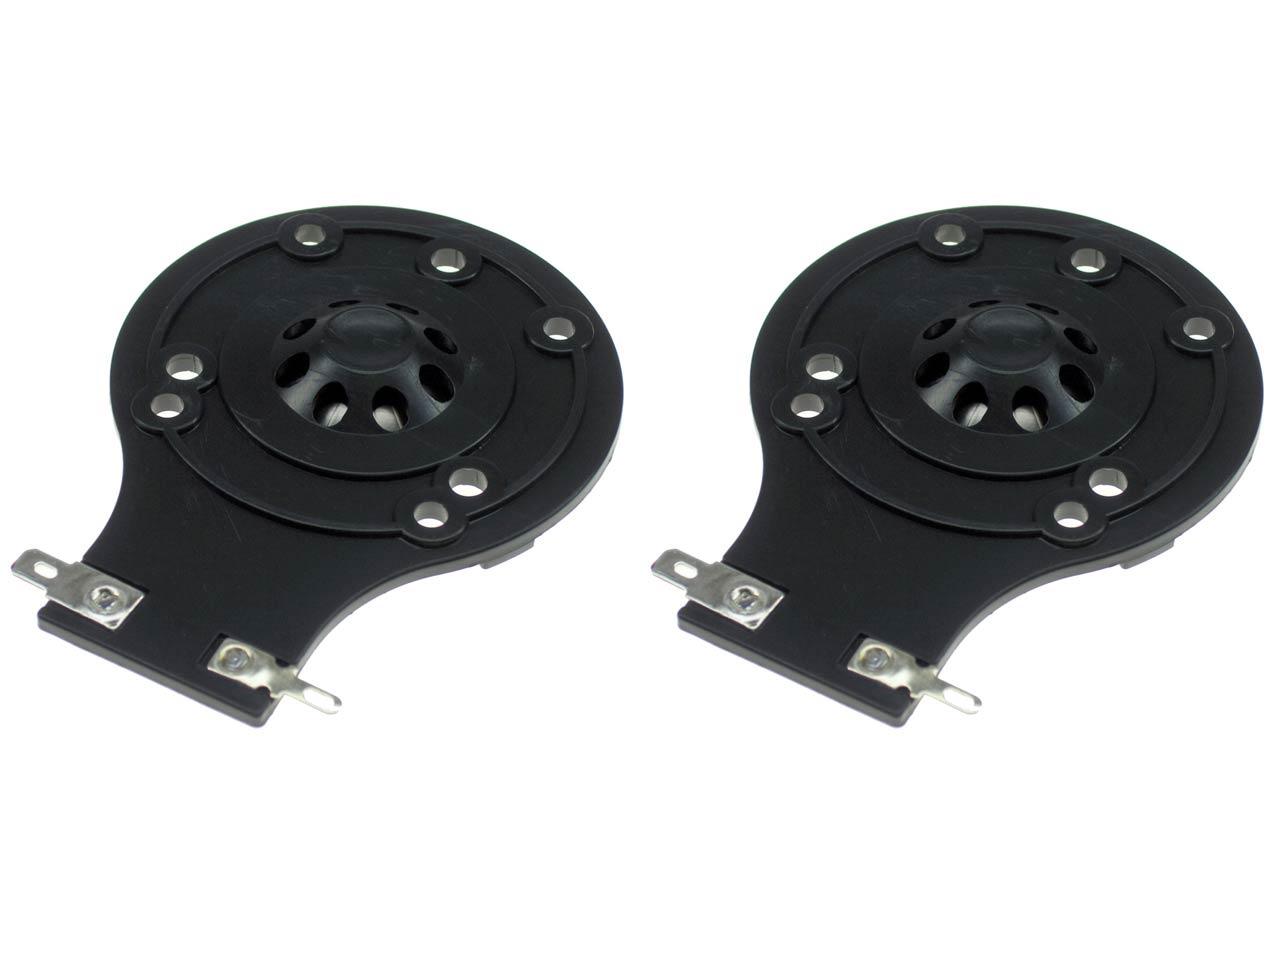 SS Audio Diaphragm for JBL 2412H, 2412H-1, 2413, JRX, TR Series, MPro,  Sound Factor, D-2412-PL-2 (2 PACK)